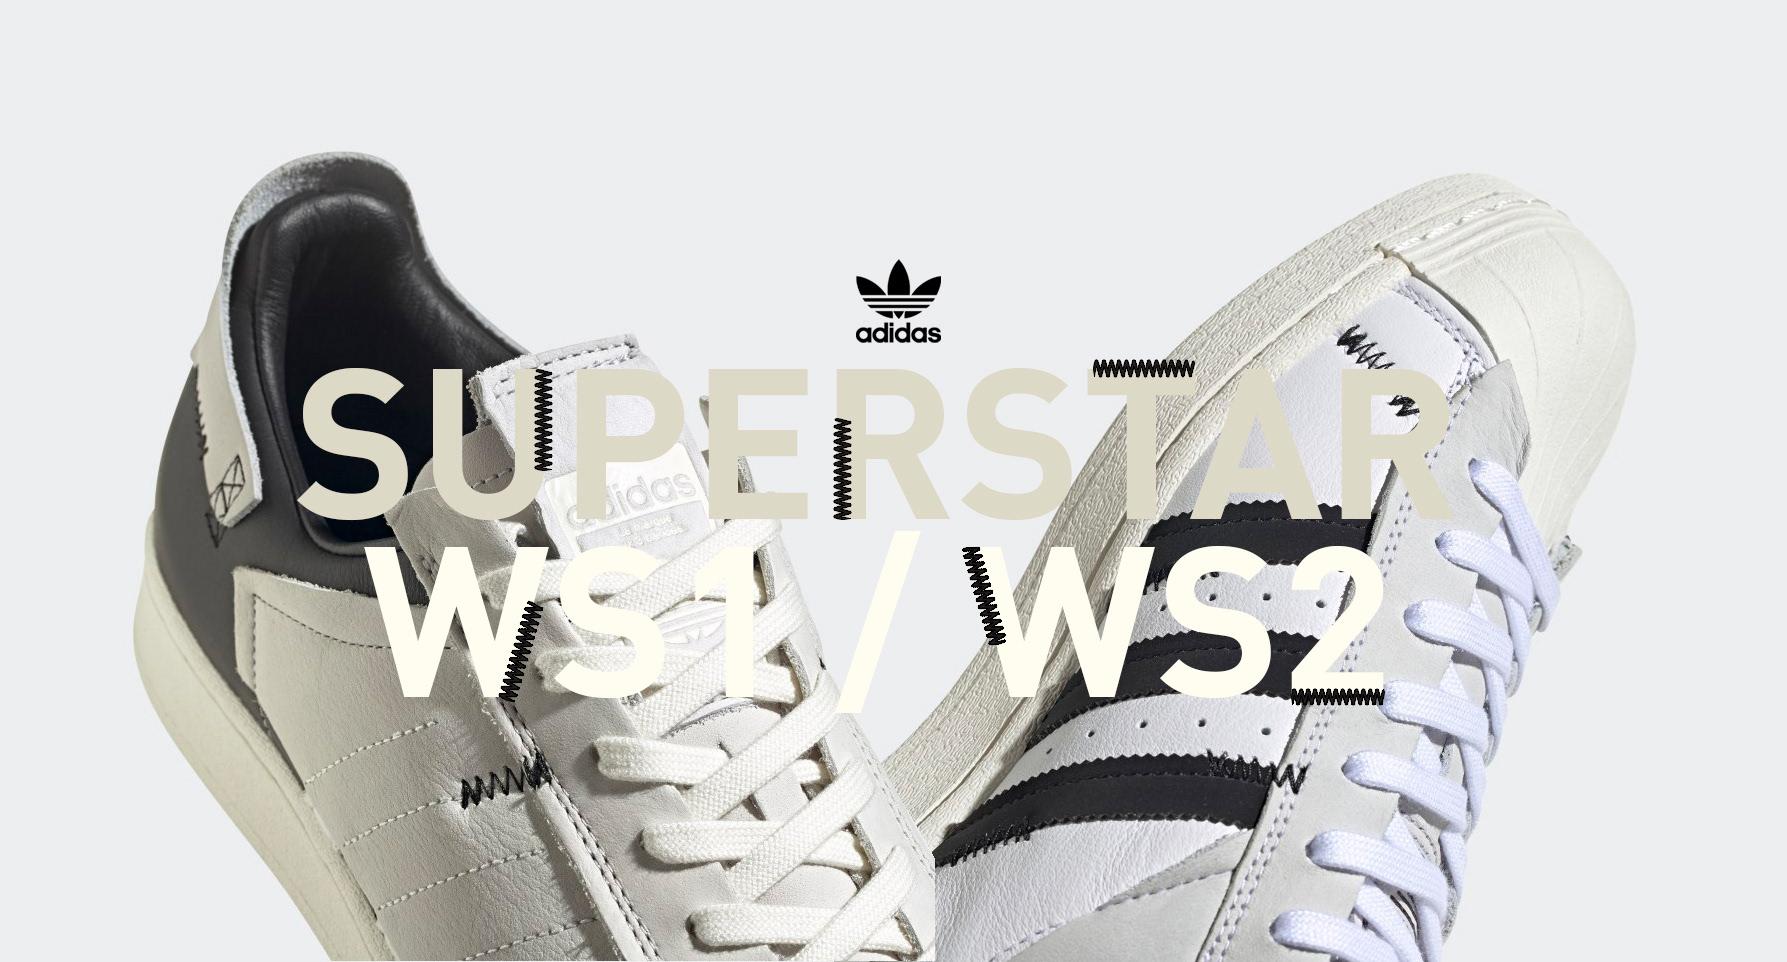 adidas superstar ws2